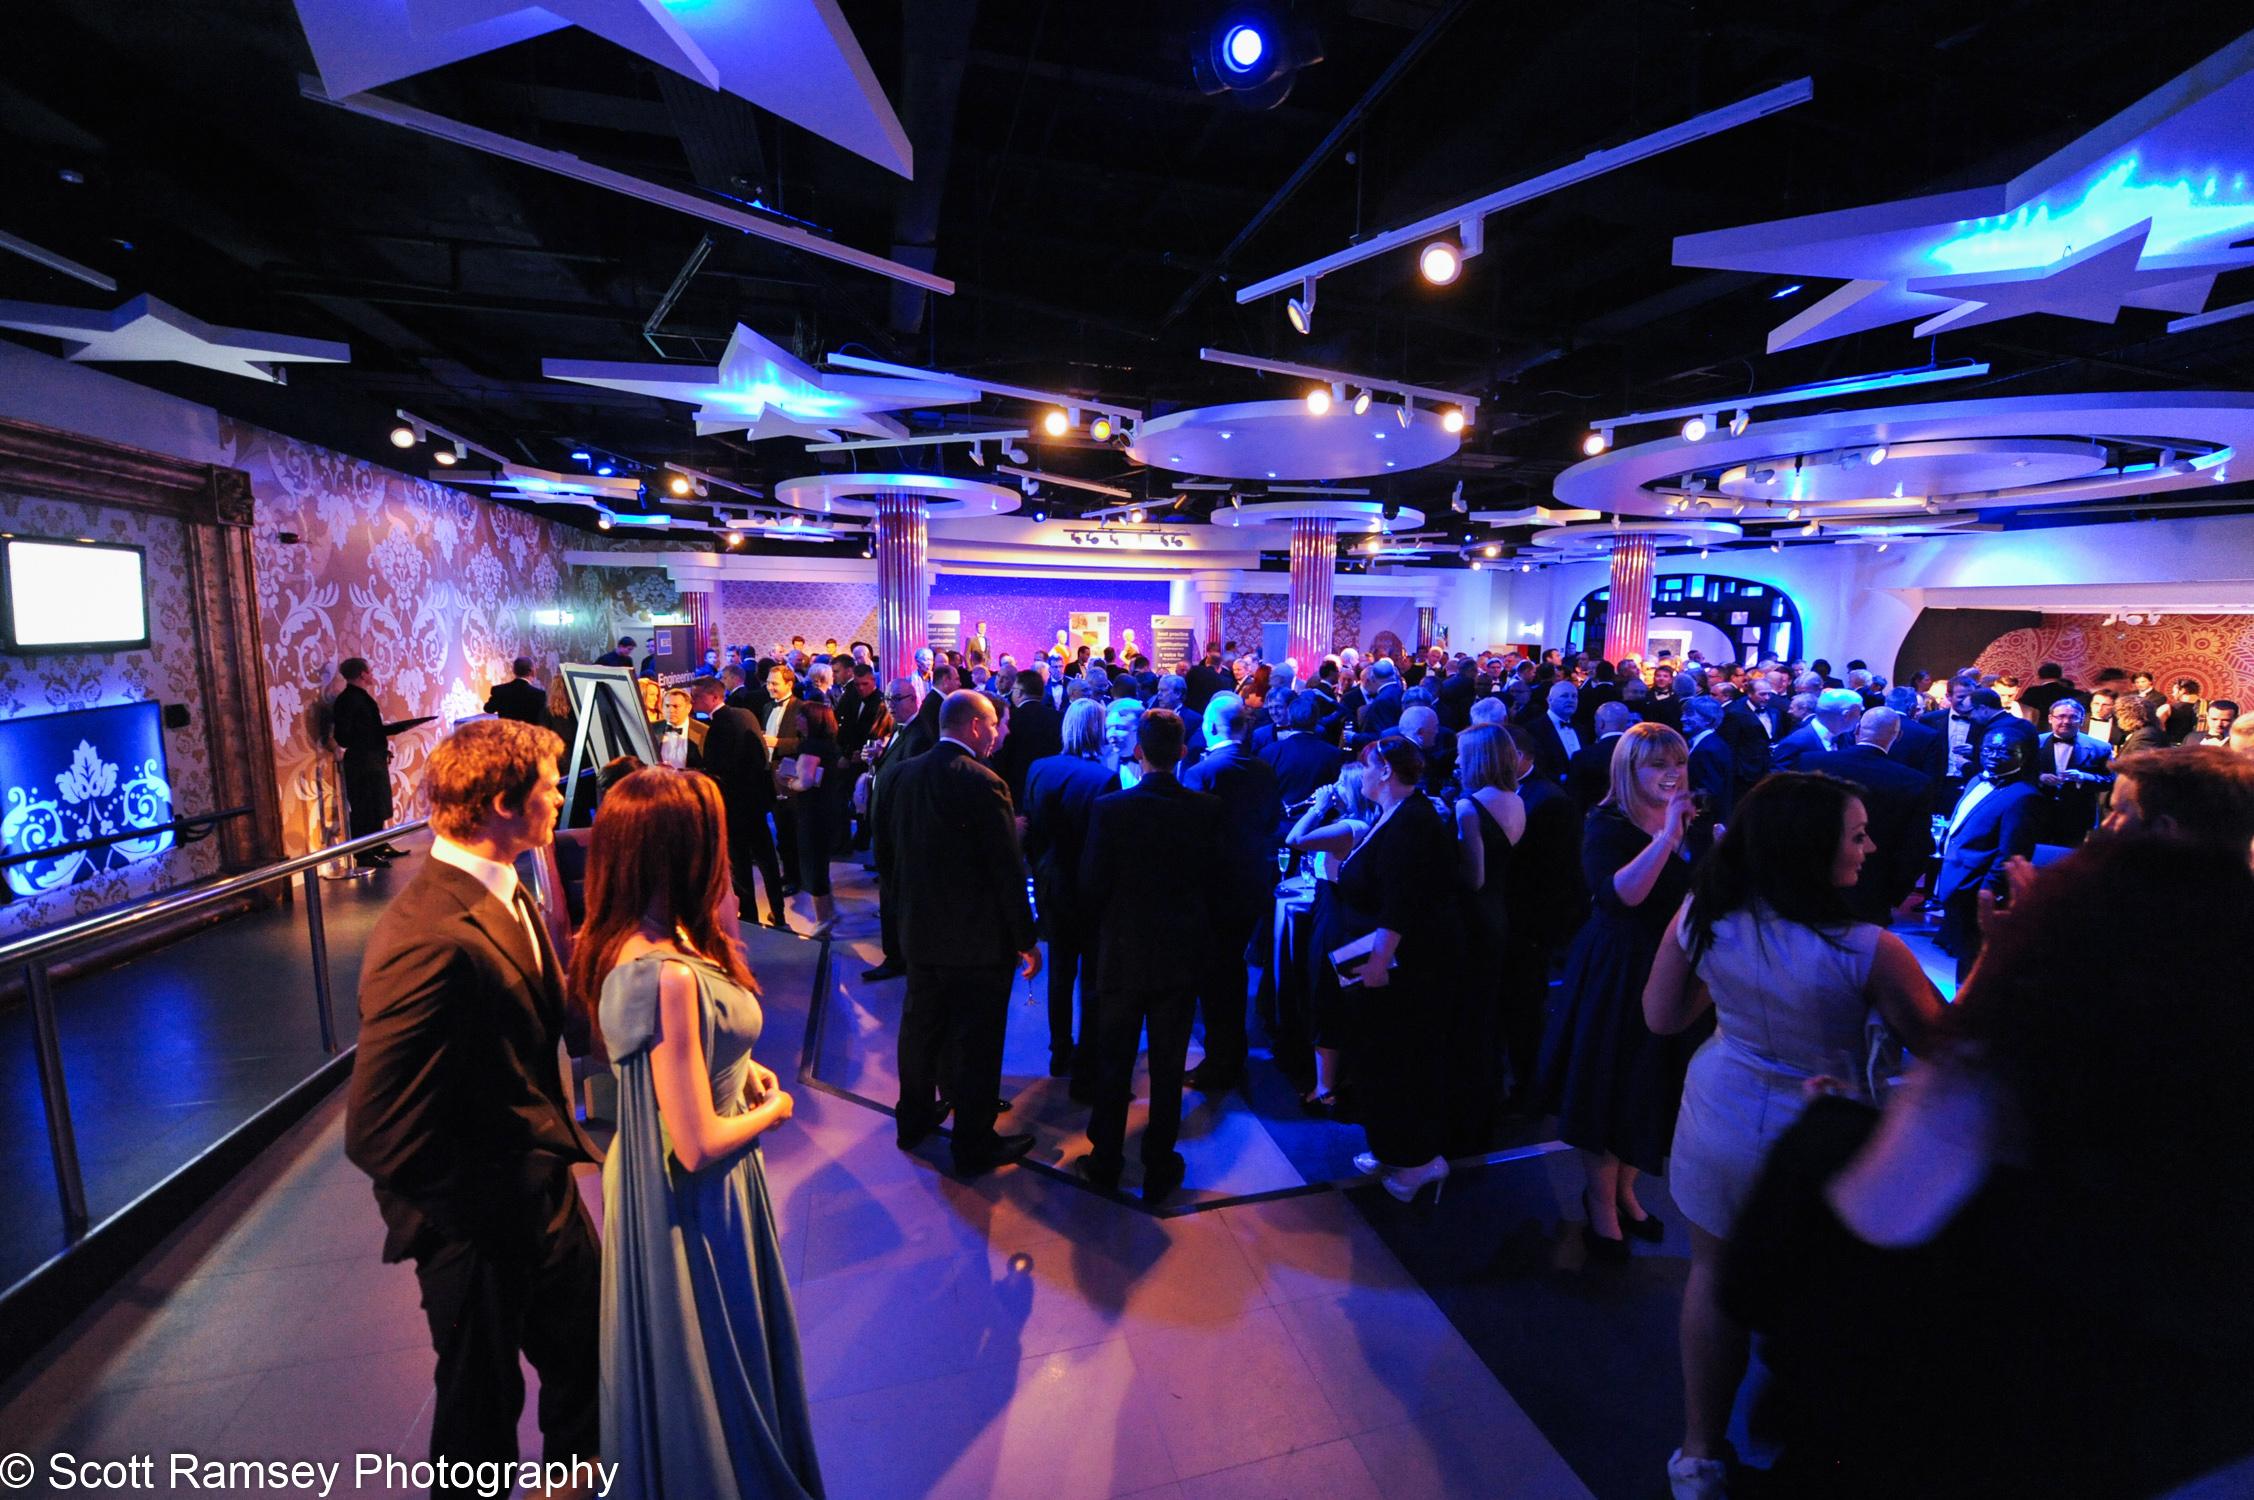 Madame Tussauds London Corporate Event 130613-11